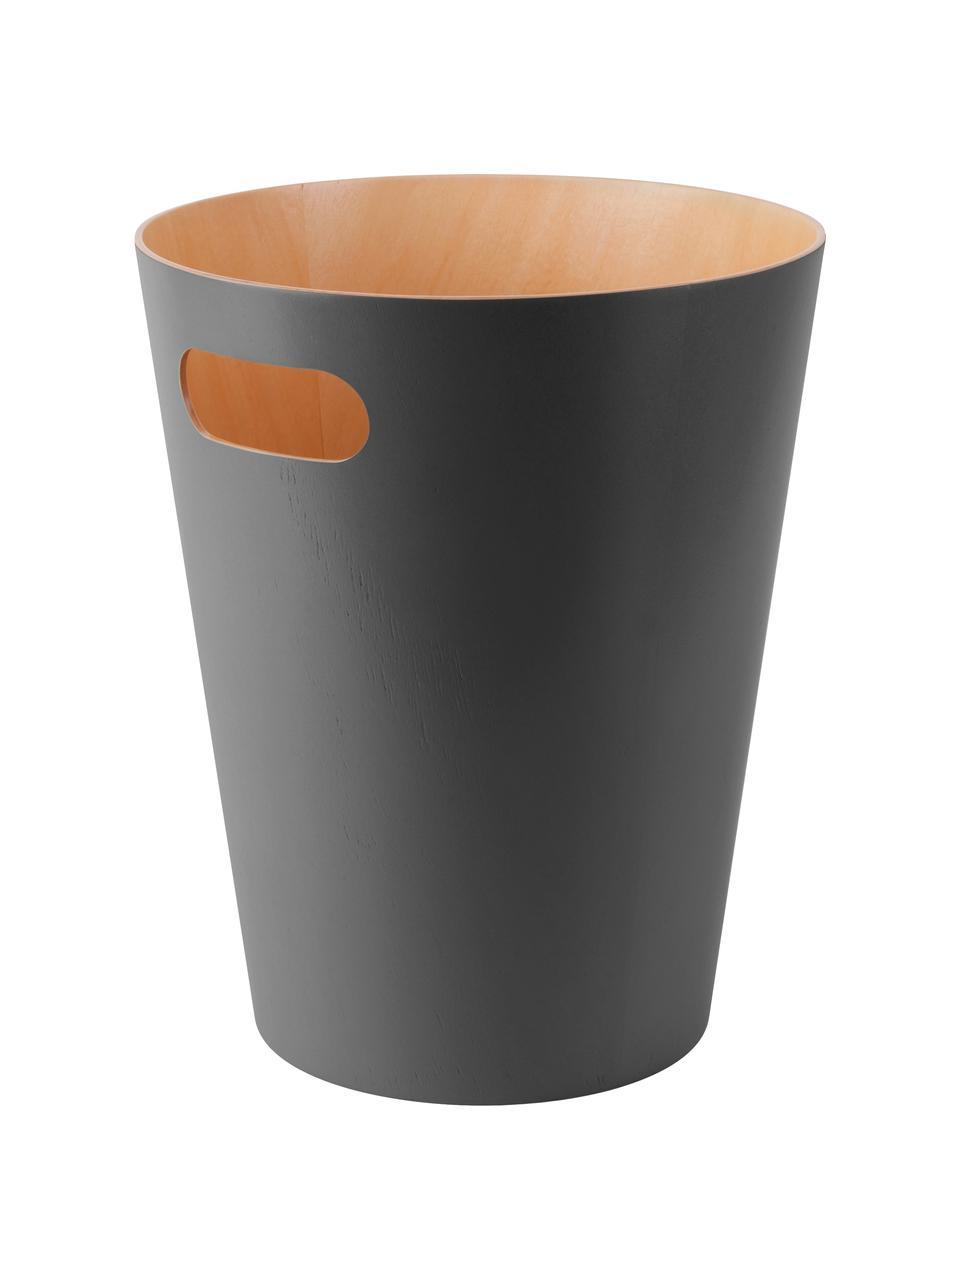 XS Papierkorb Woodrow Can, Holz, lackiert, Anthrazit, Ø 23 x H 28 cm